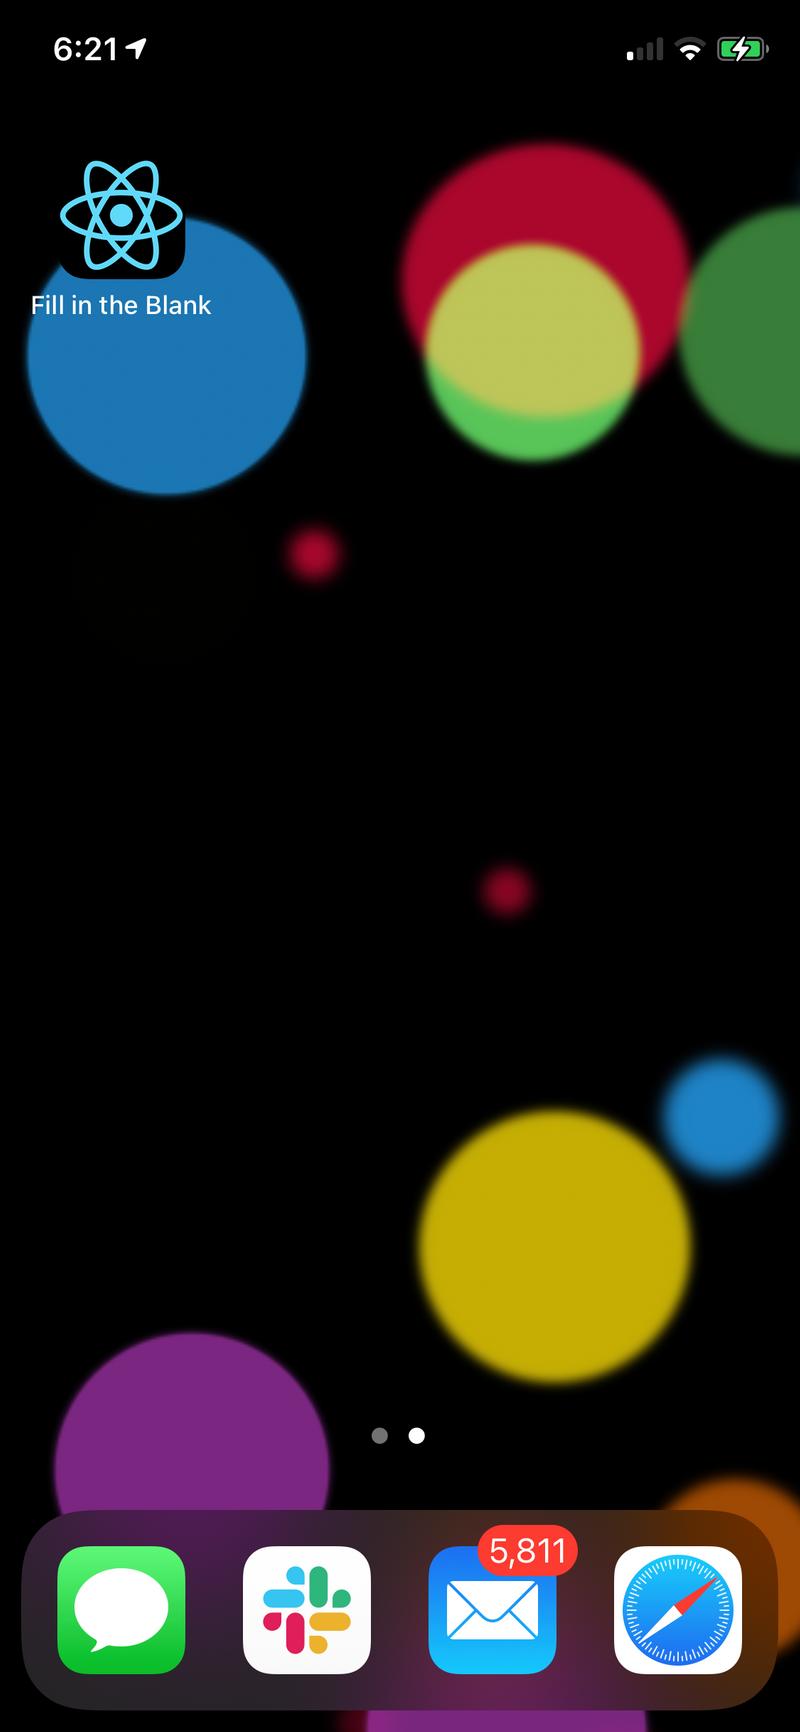 Screenshot of App on the Home Screen